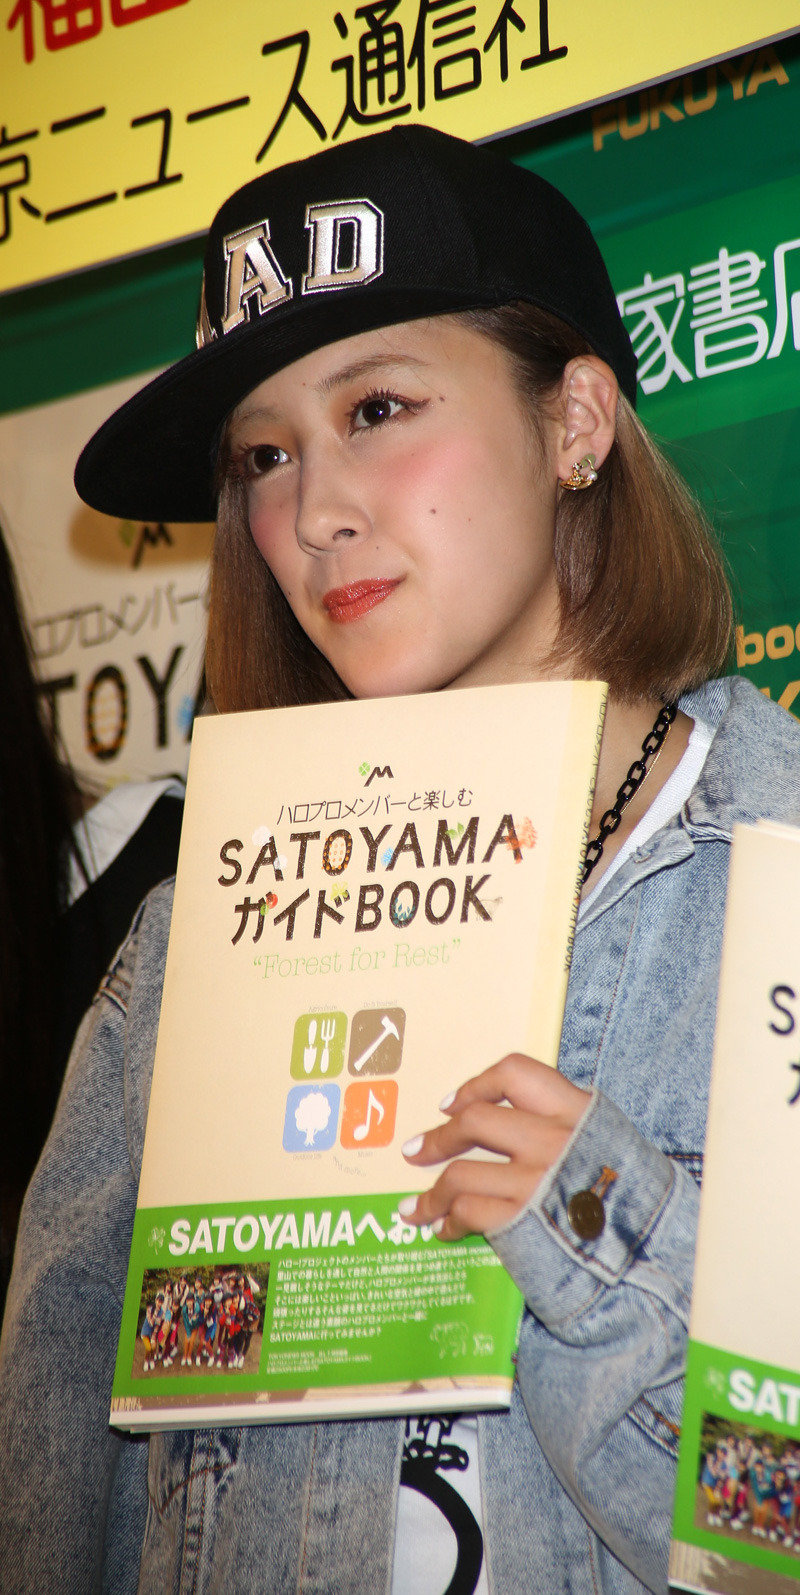 Handshake pour le Satoyama Book